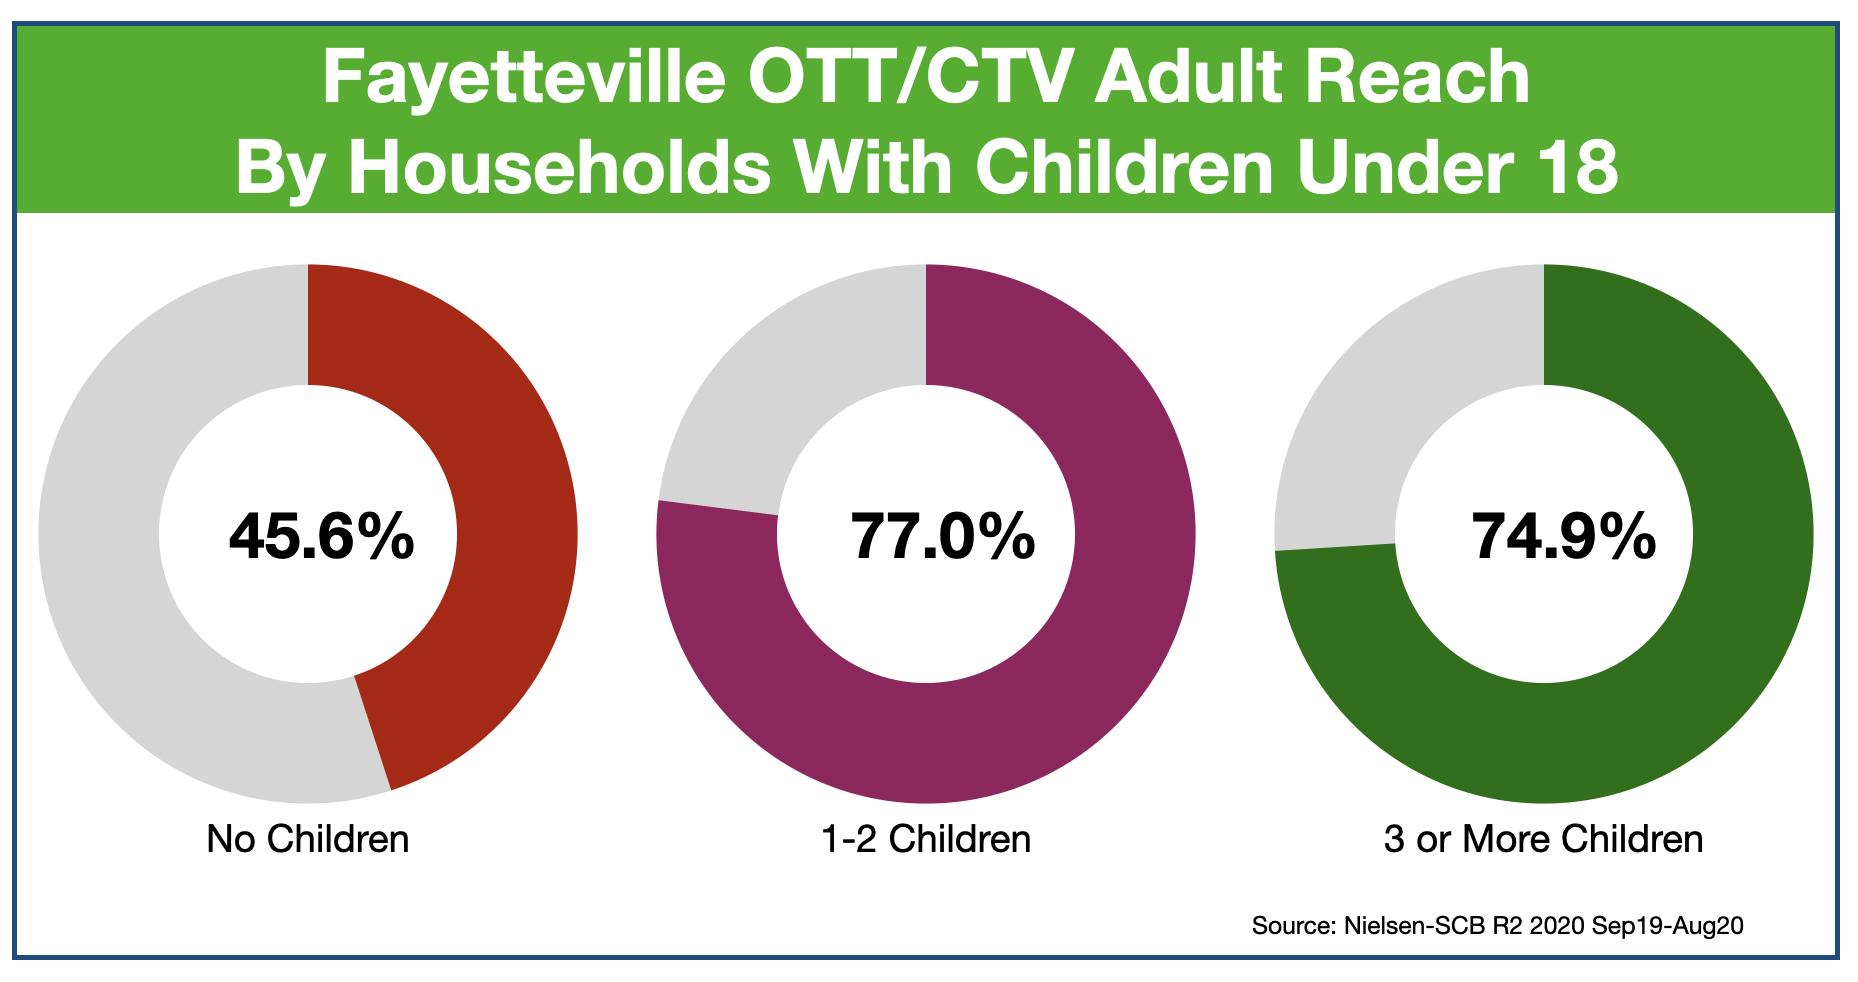 OTT & CTV Advertising in Fayetteville: Reaching Parents